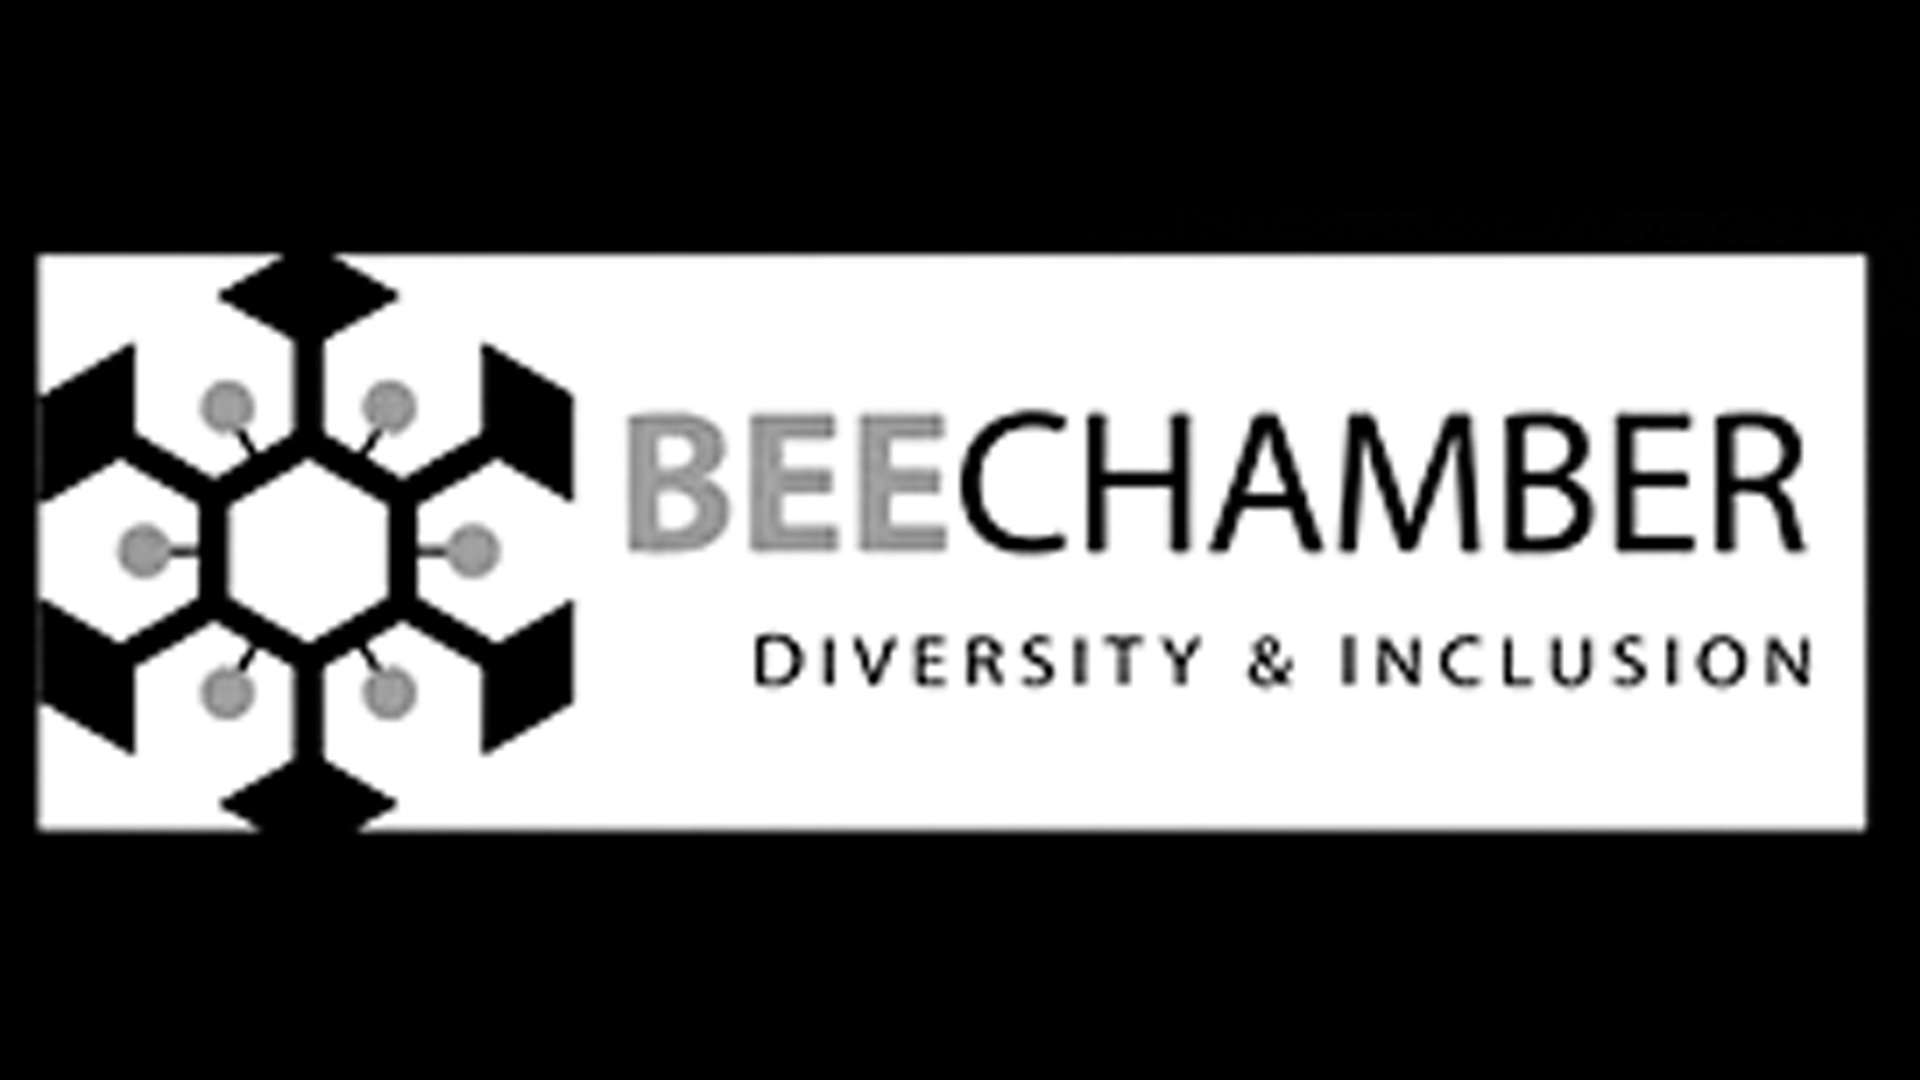 Bee Chamber